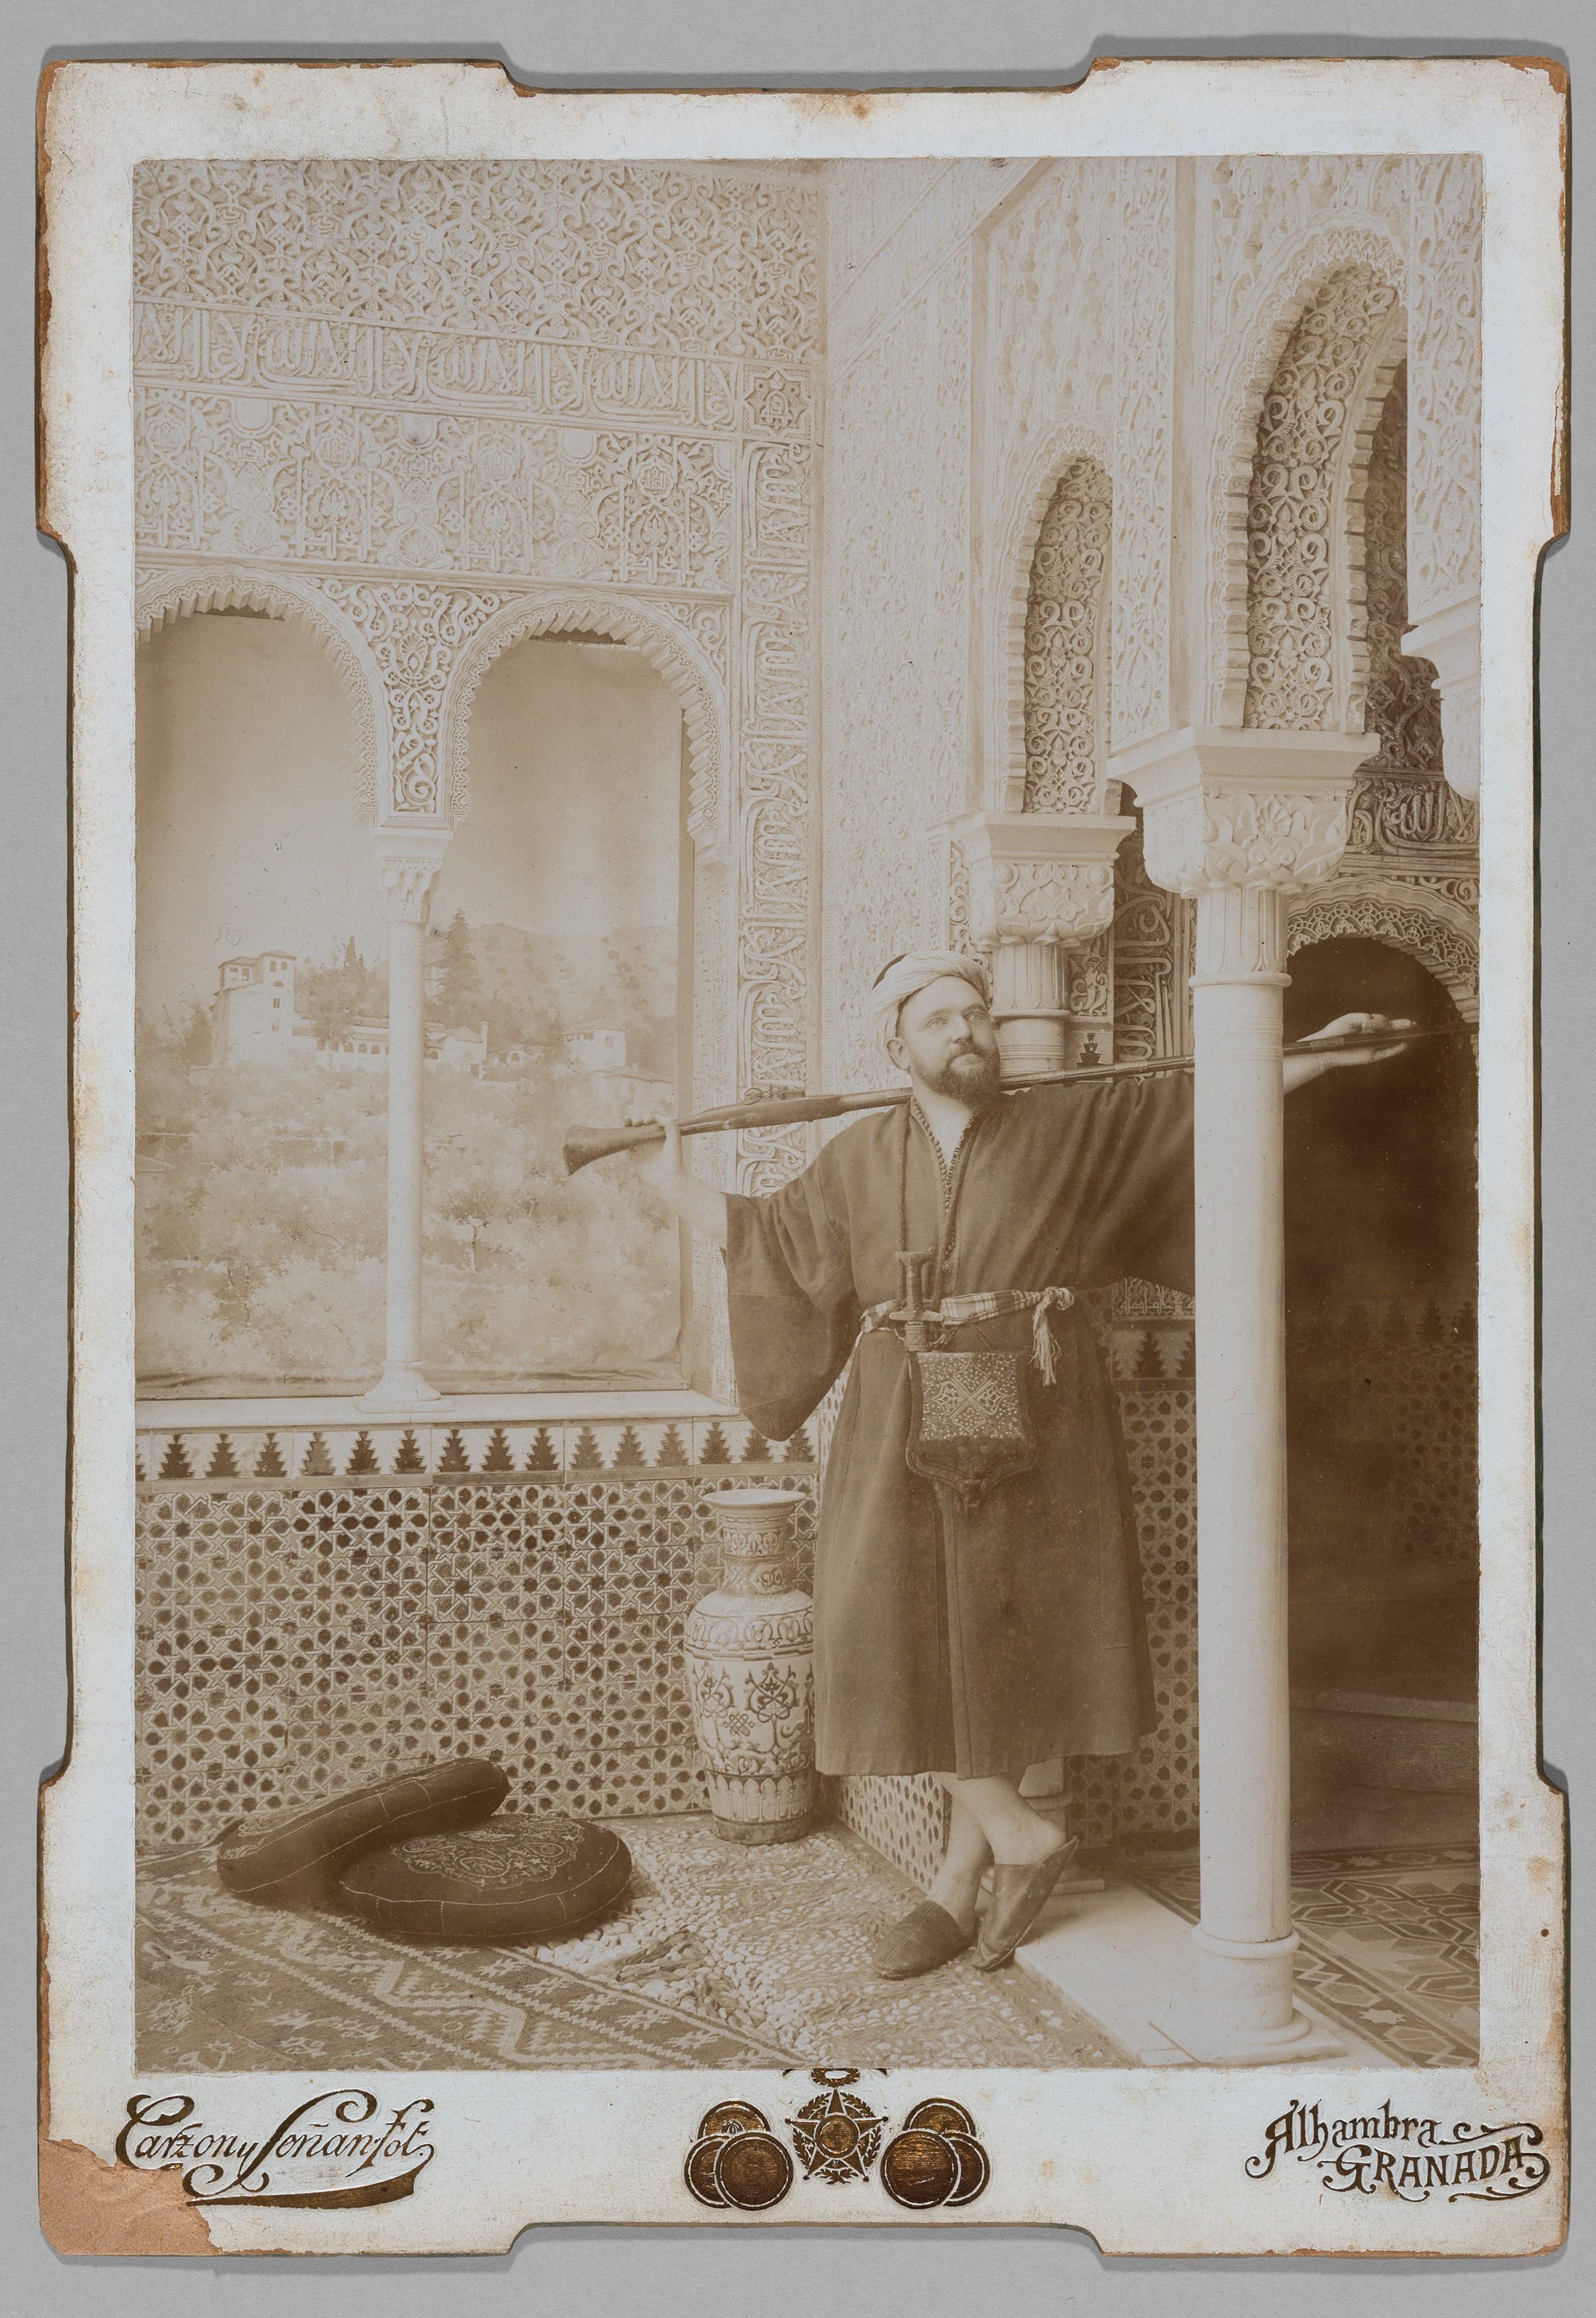 Wilhelm Gentz in Oriental garb in the Alhambra, Granada (Spain), Photographie, 1847 (Museum Neuruppin, CC BY-NC-SA)